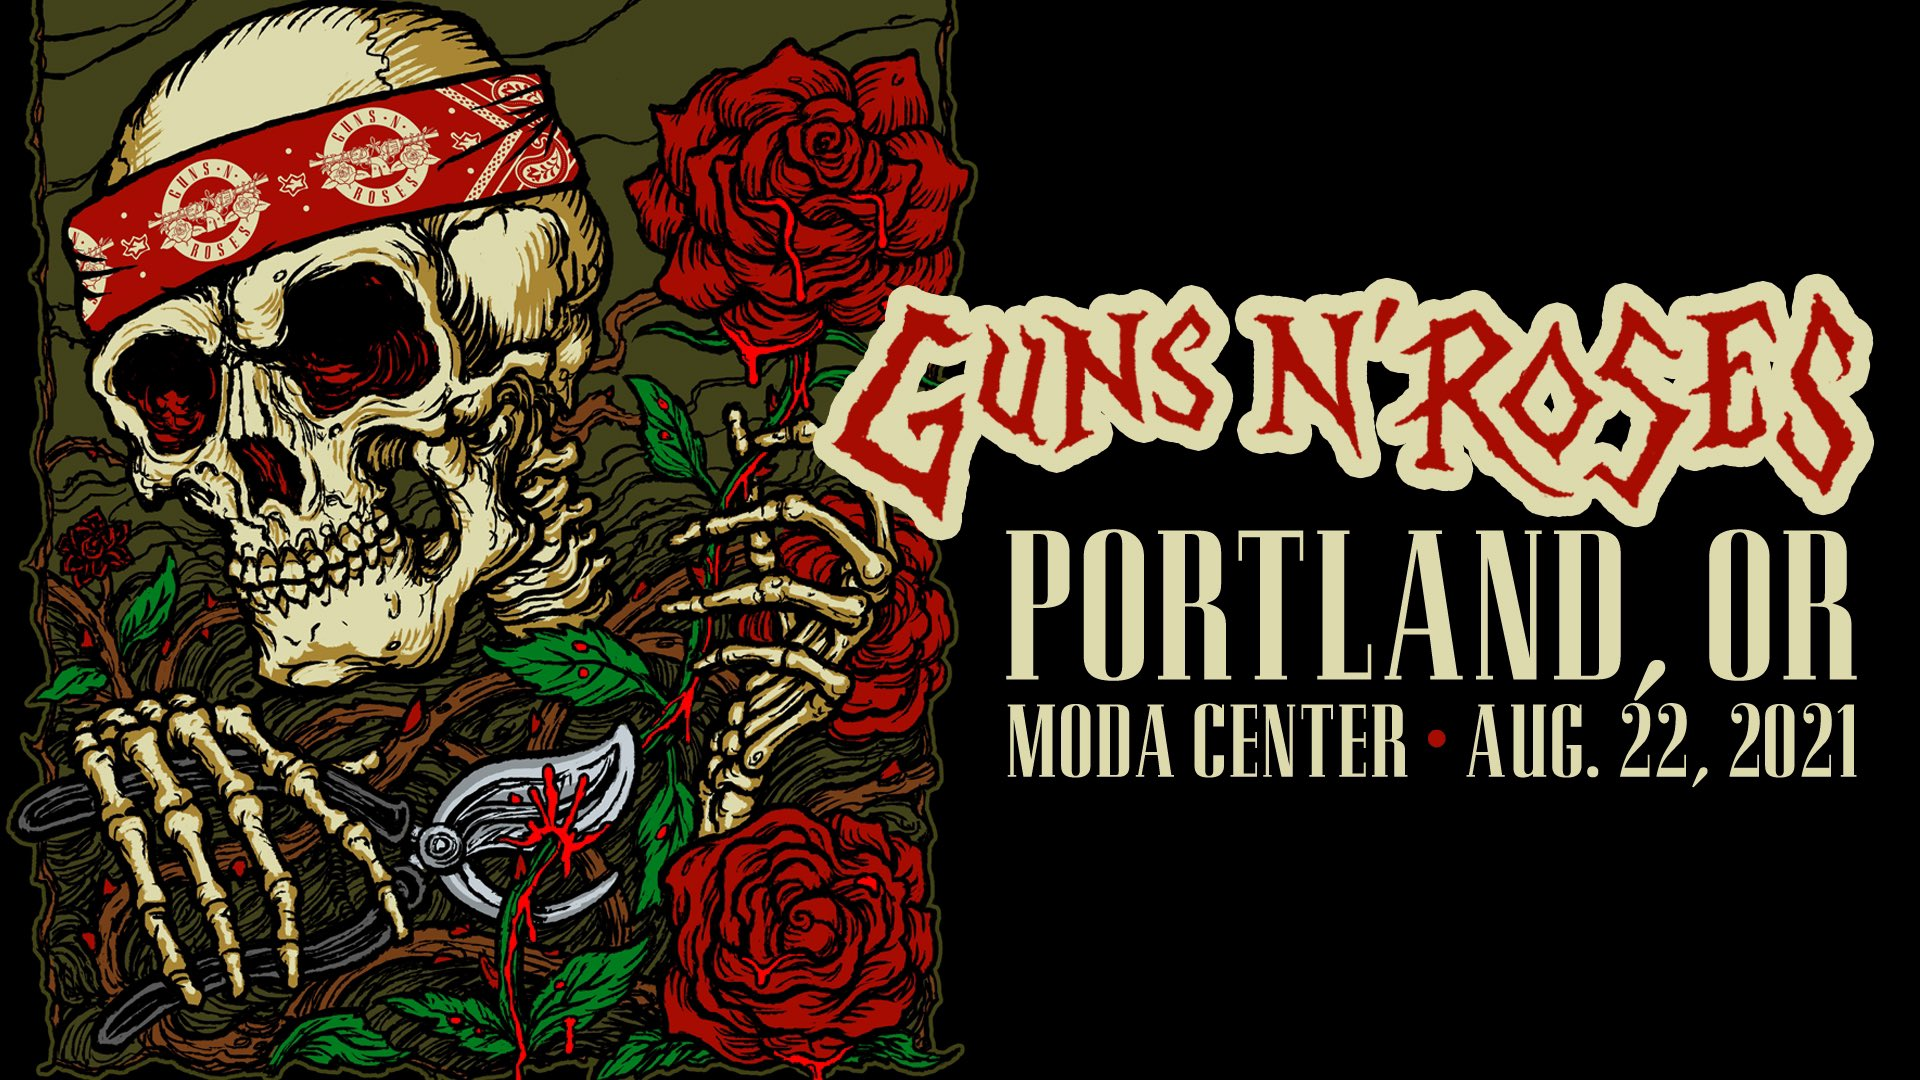 2021.08.22 - MODA Center, Portland, OR, USA E9z28r10